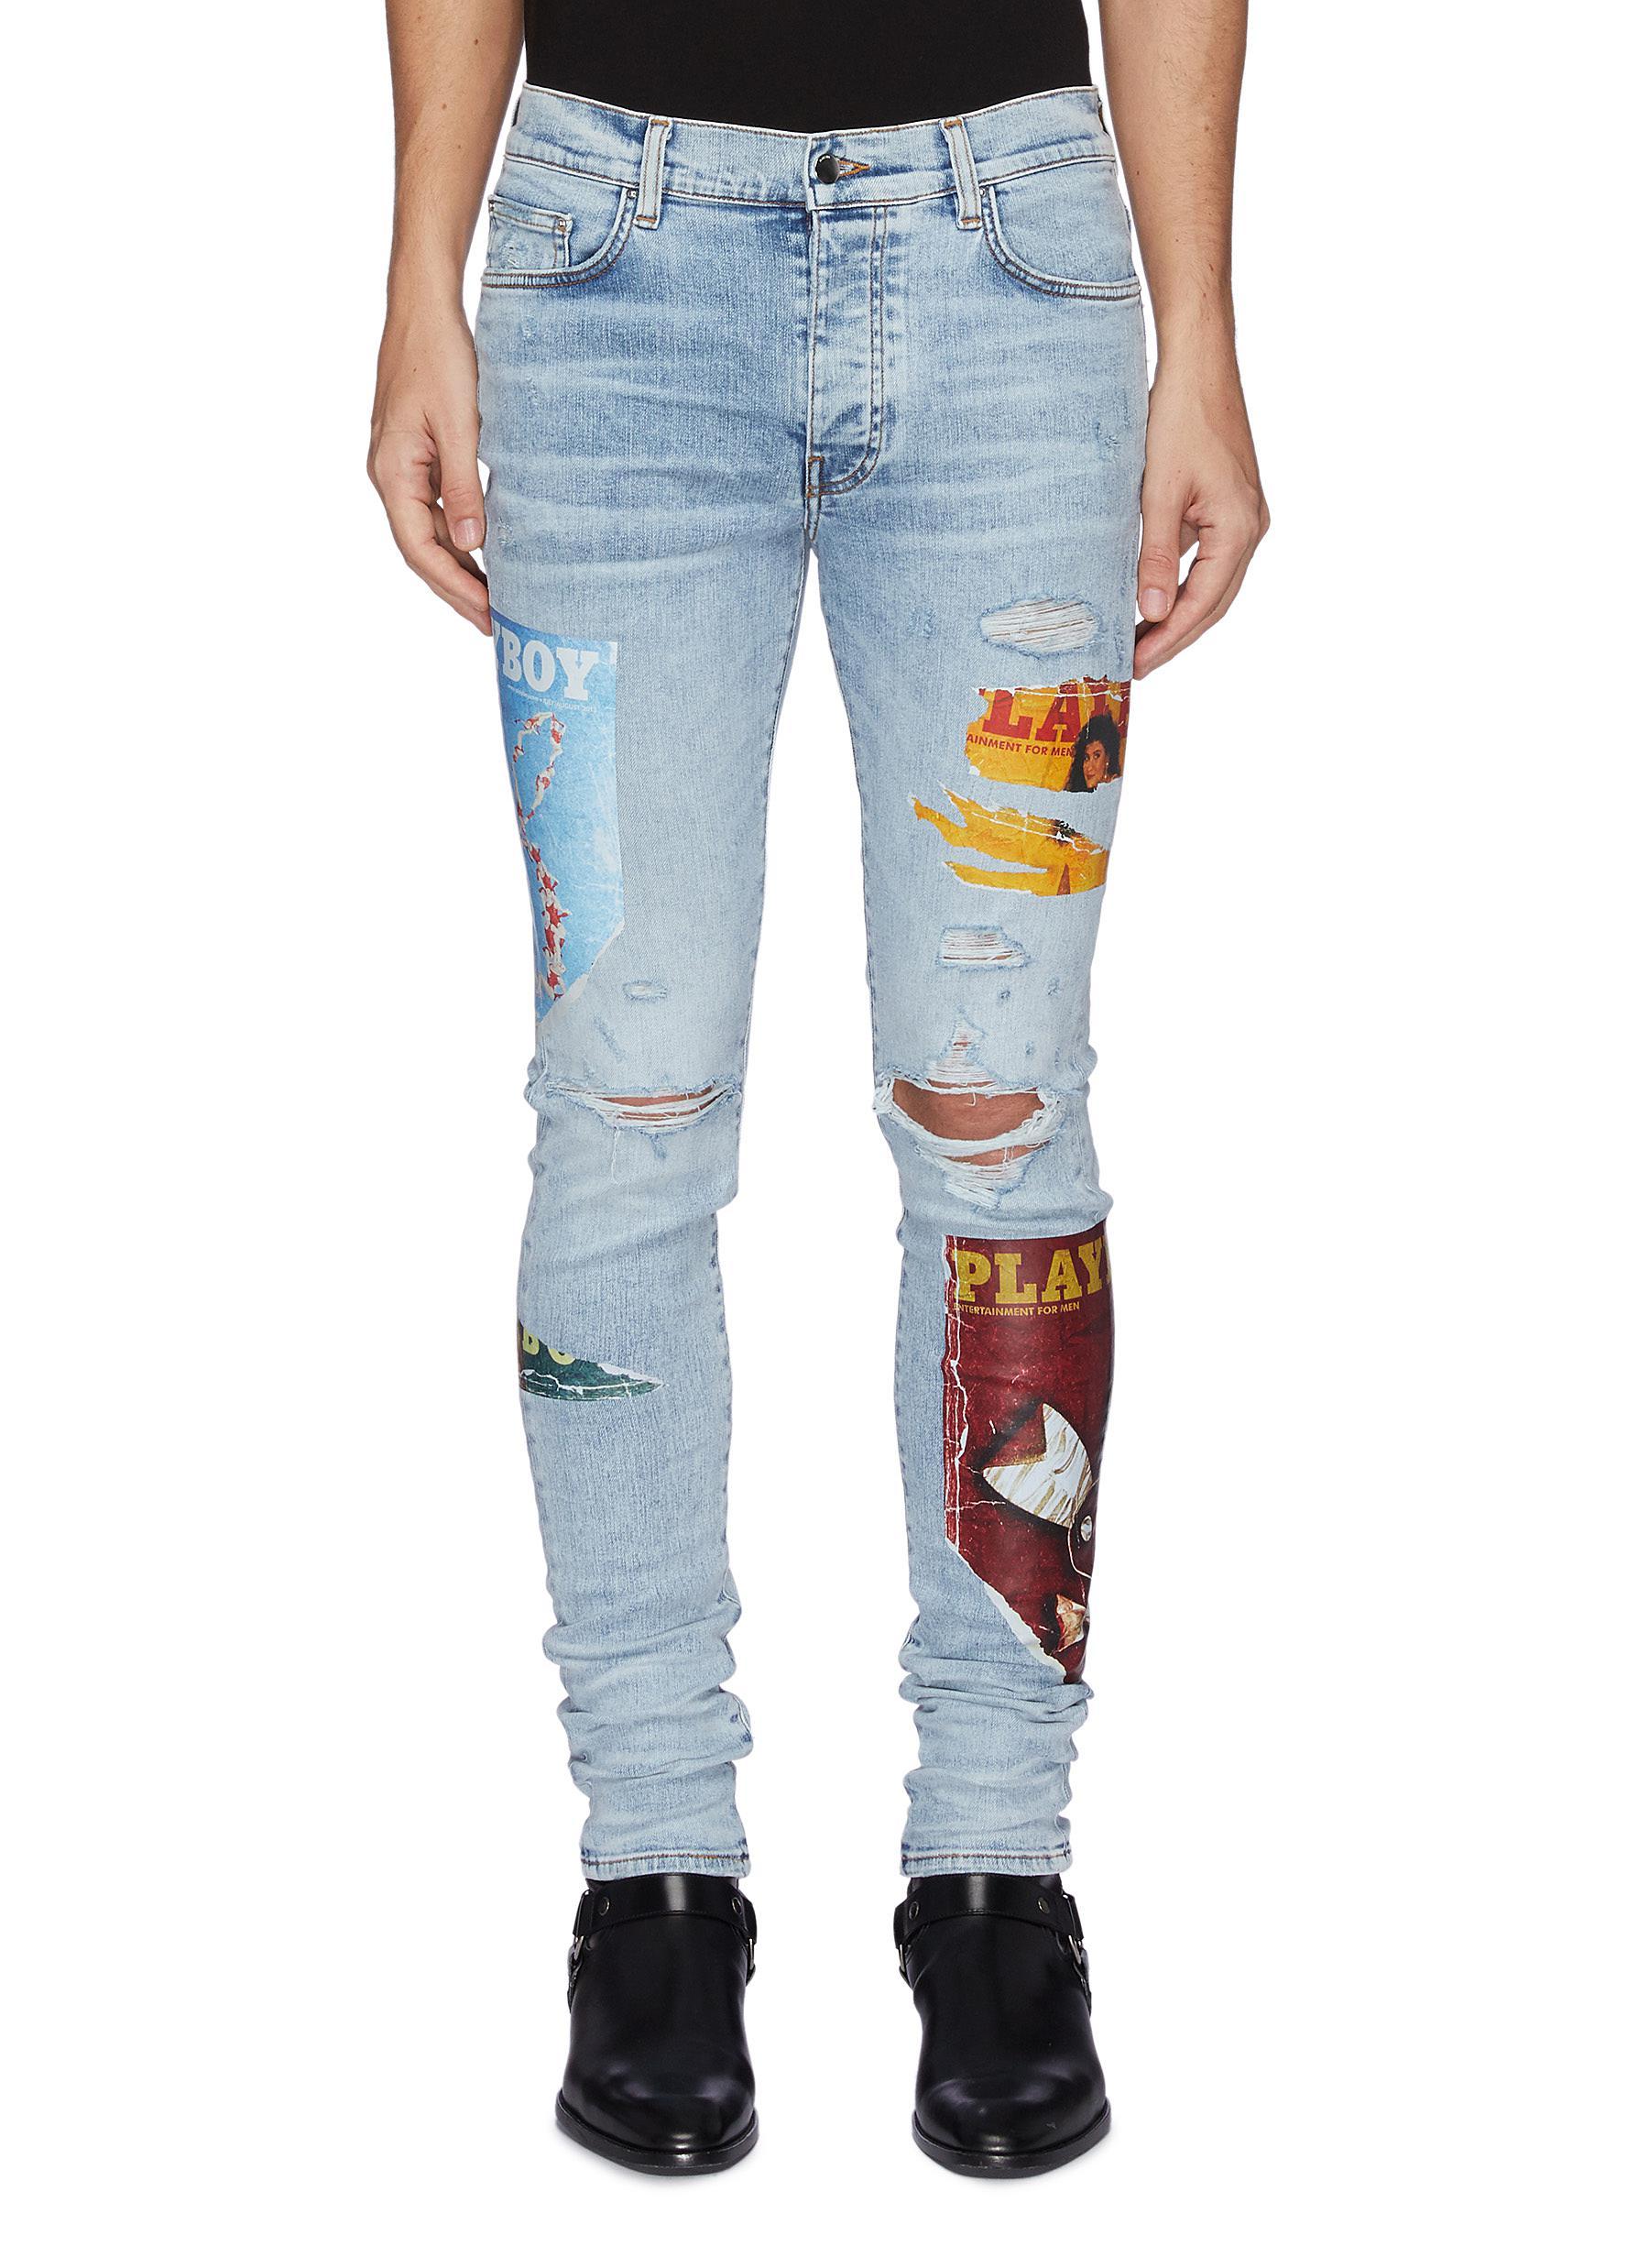 Playboy Magazine Distress Detail Slim Jeans